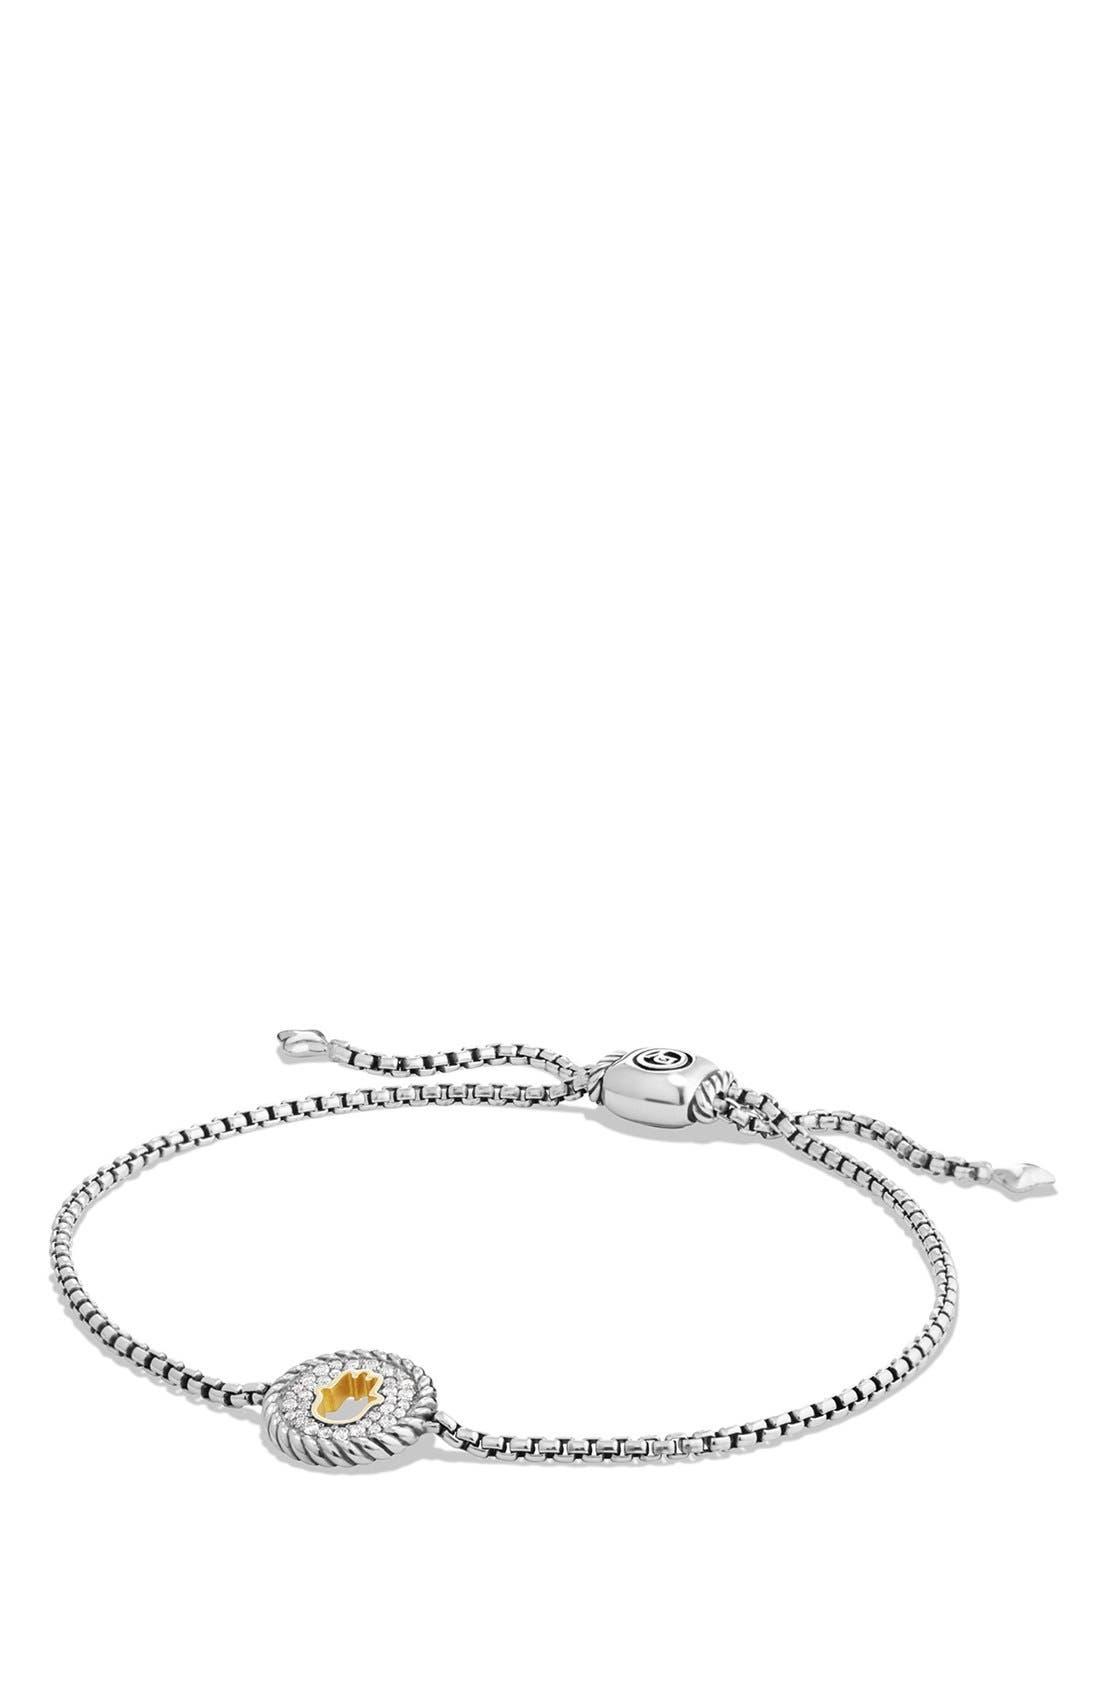 David Yurman 'Cable Collection' Petite Pavé Hamsa Bracelet